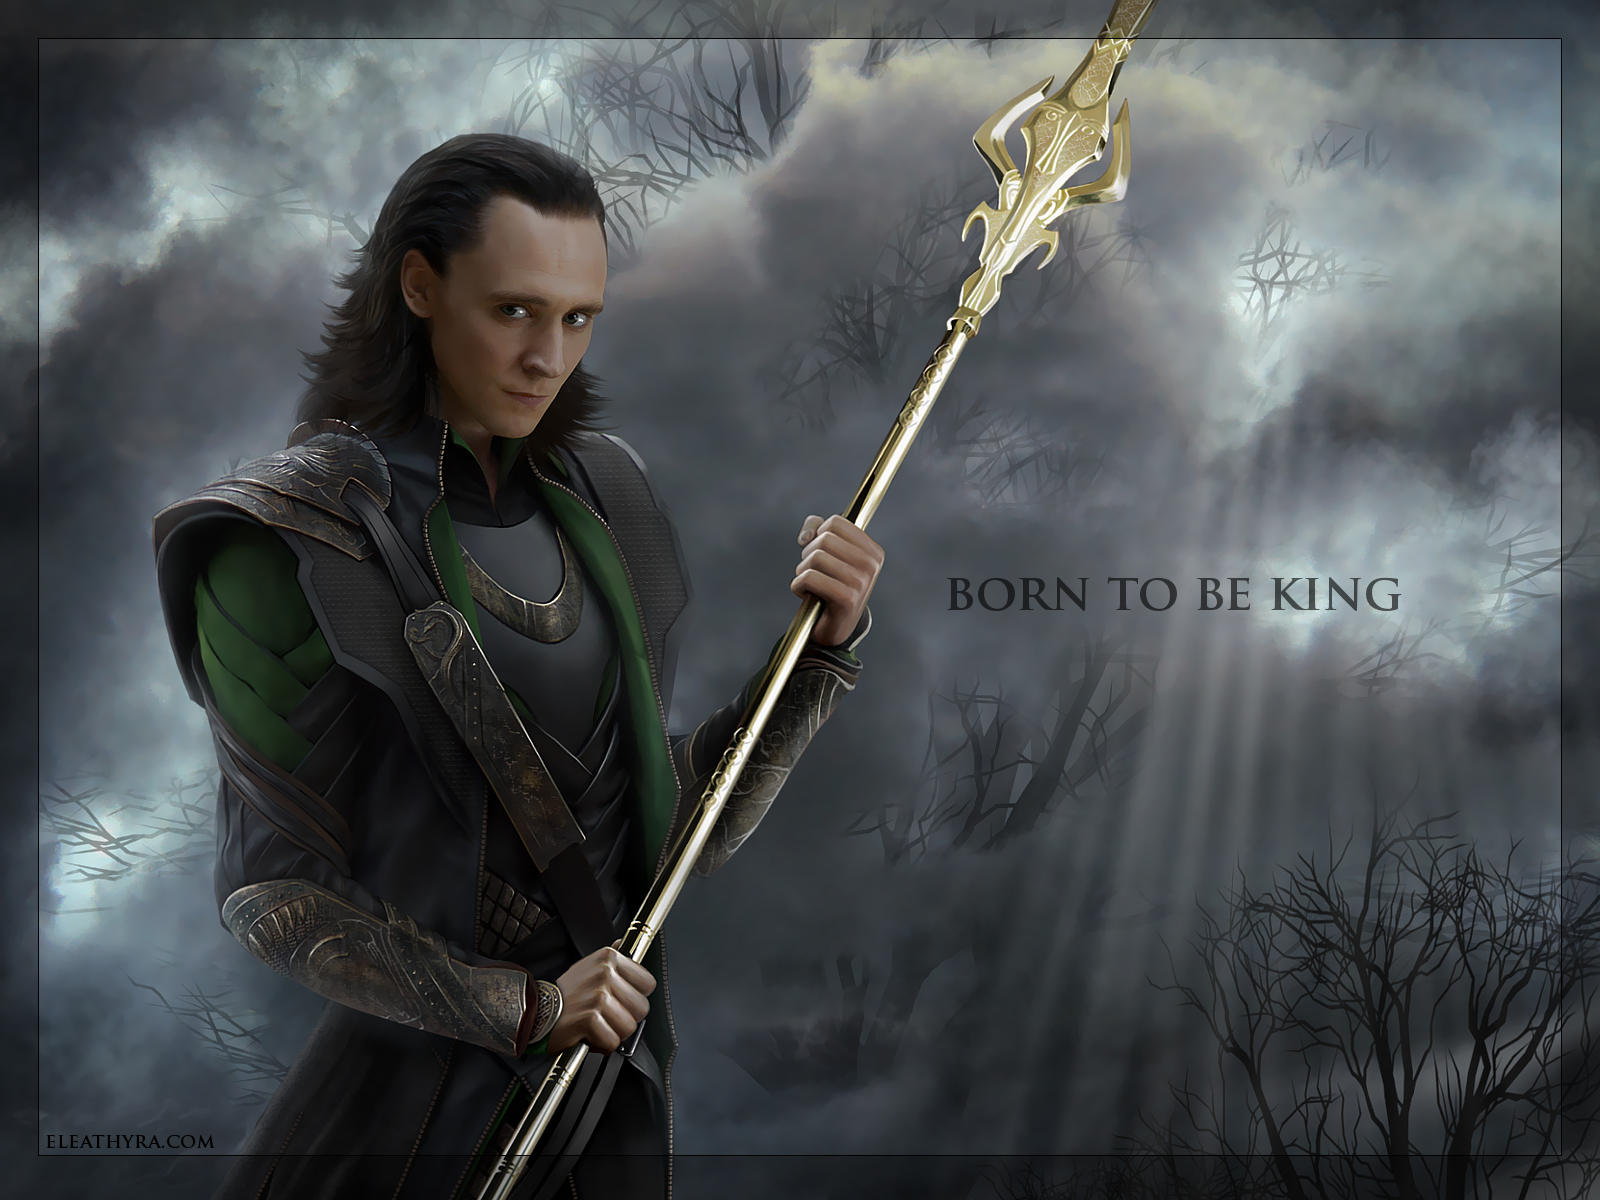 Most Inspiring Wallpaper Marvel Loki - born_to_be_king___loki_wallpaper_by_eleathyra-d6n4ghl  Trends_1001865.jpg